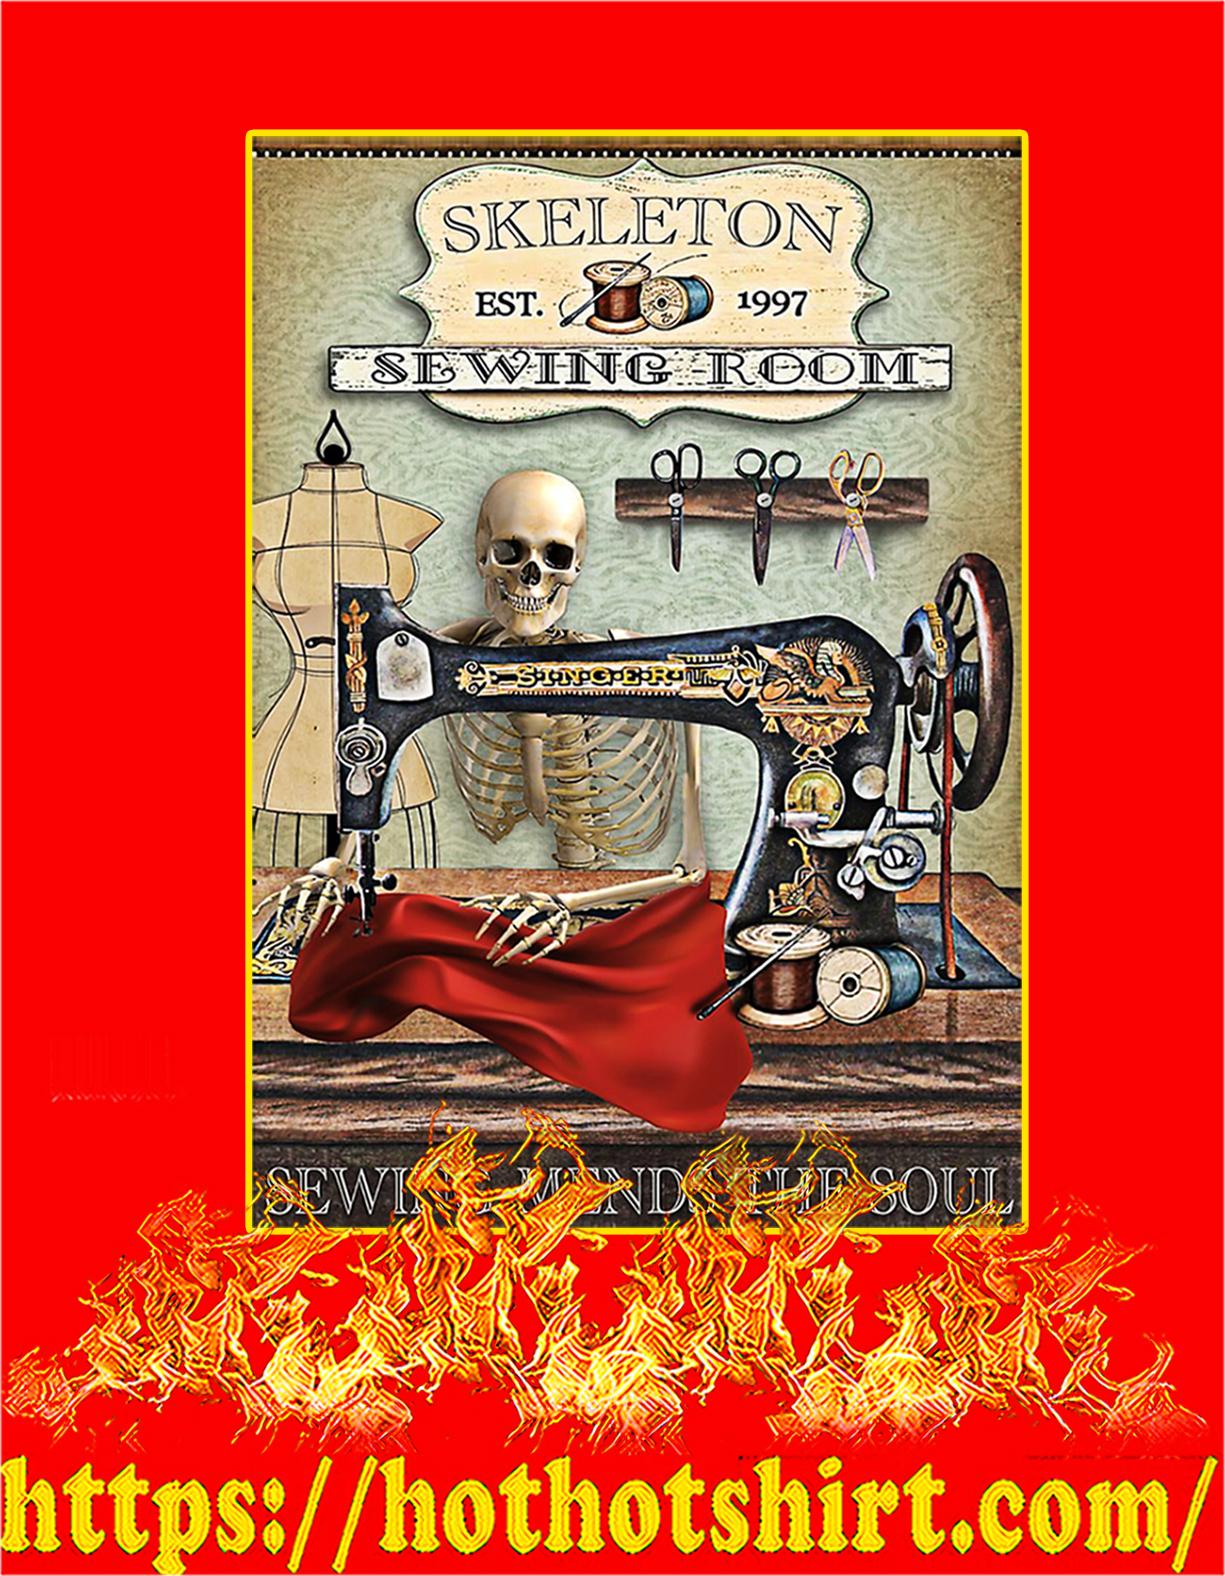 Skeleton sewing room poster - 4